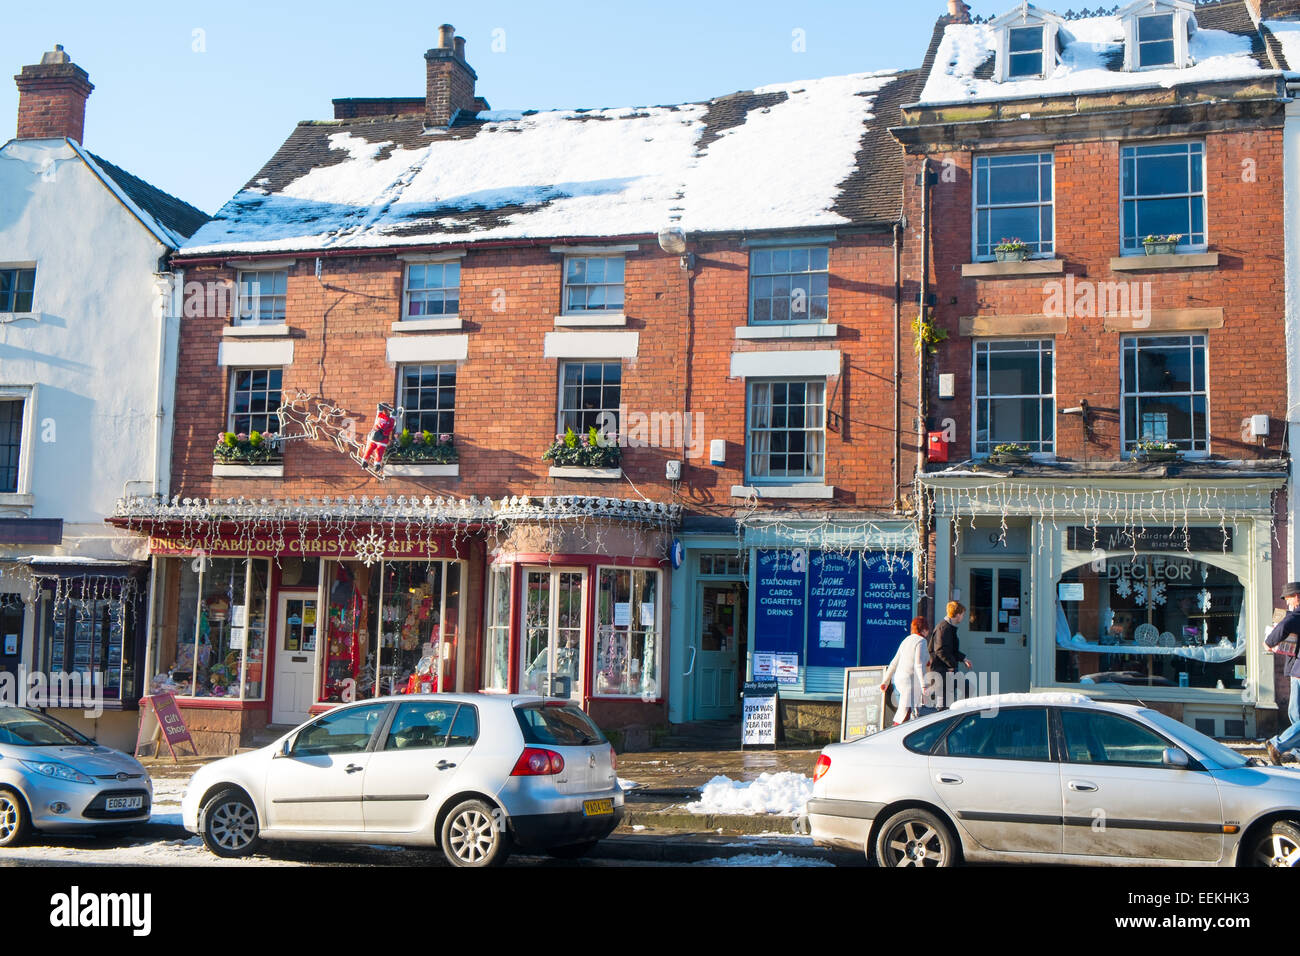 village of Wirksworth in Derbyshire Dales,England - Stock Image